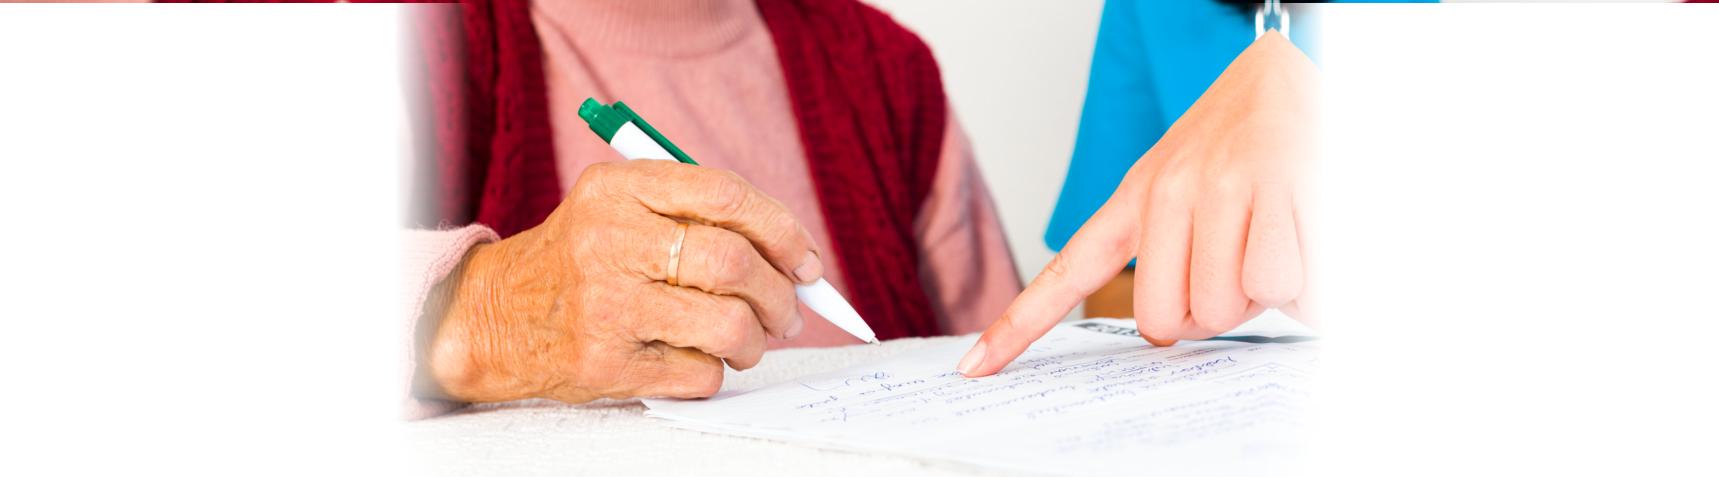 old woman writing something